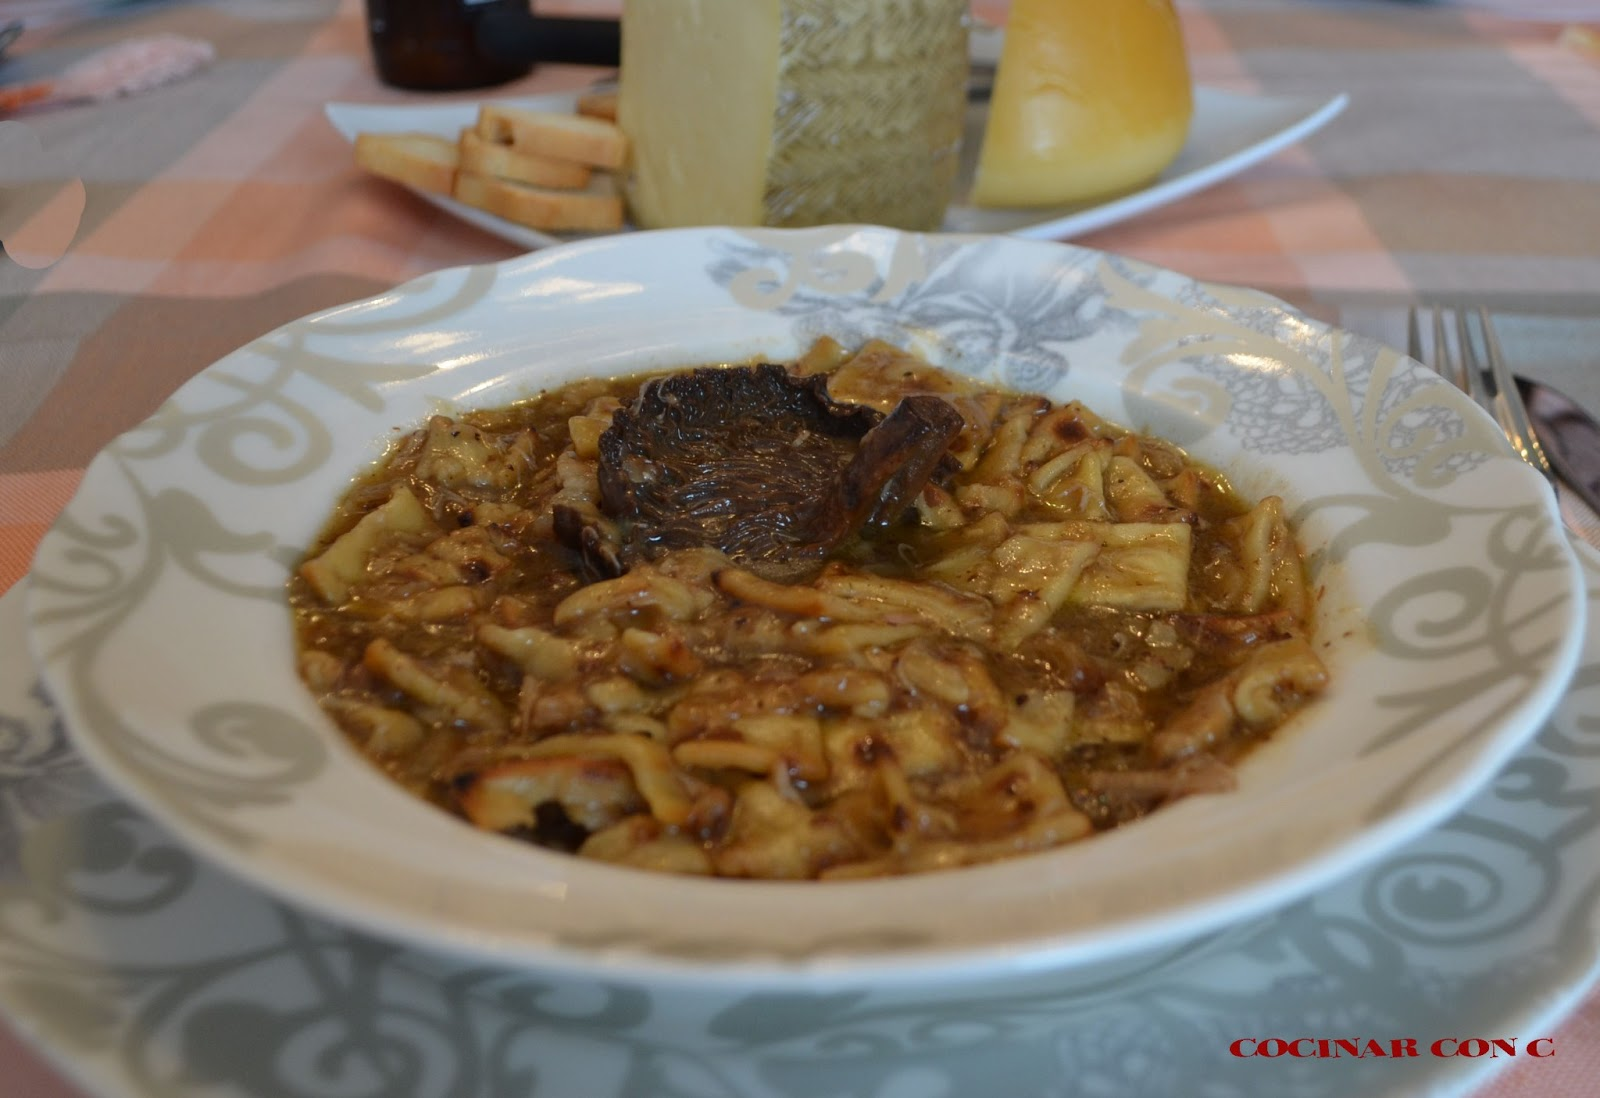 Cocinar con c gazpacho manchego for Cocinar con 5 ingredientes